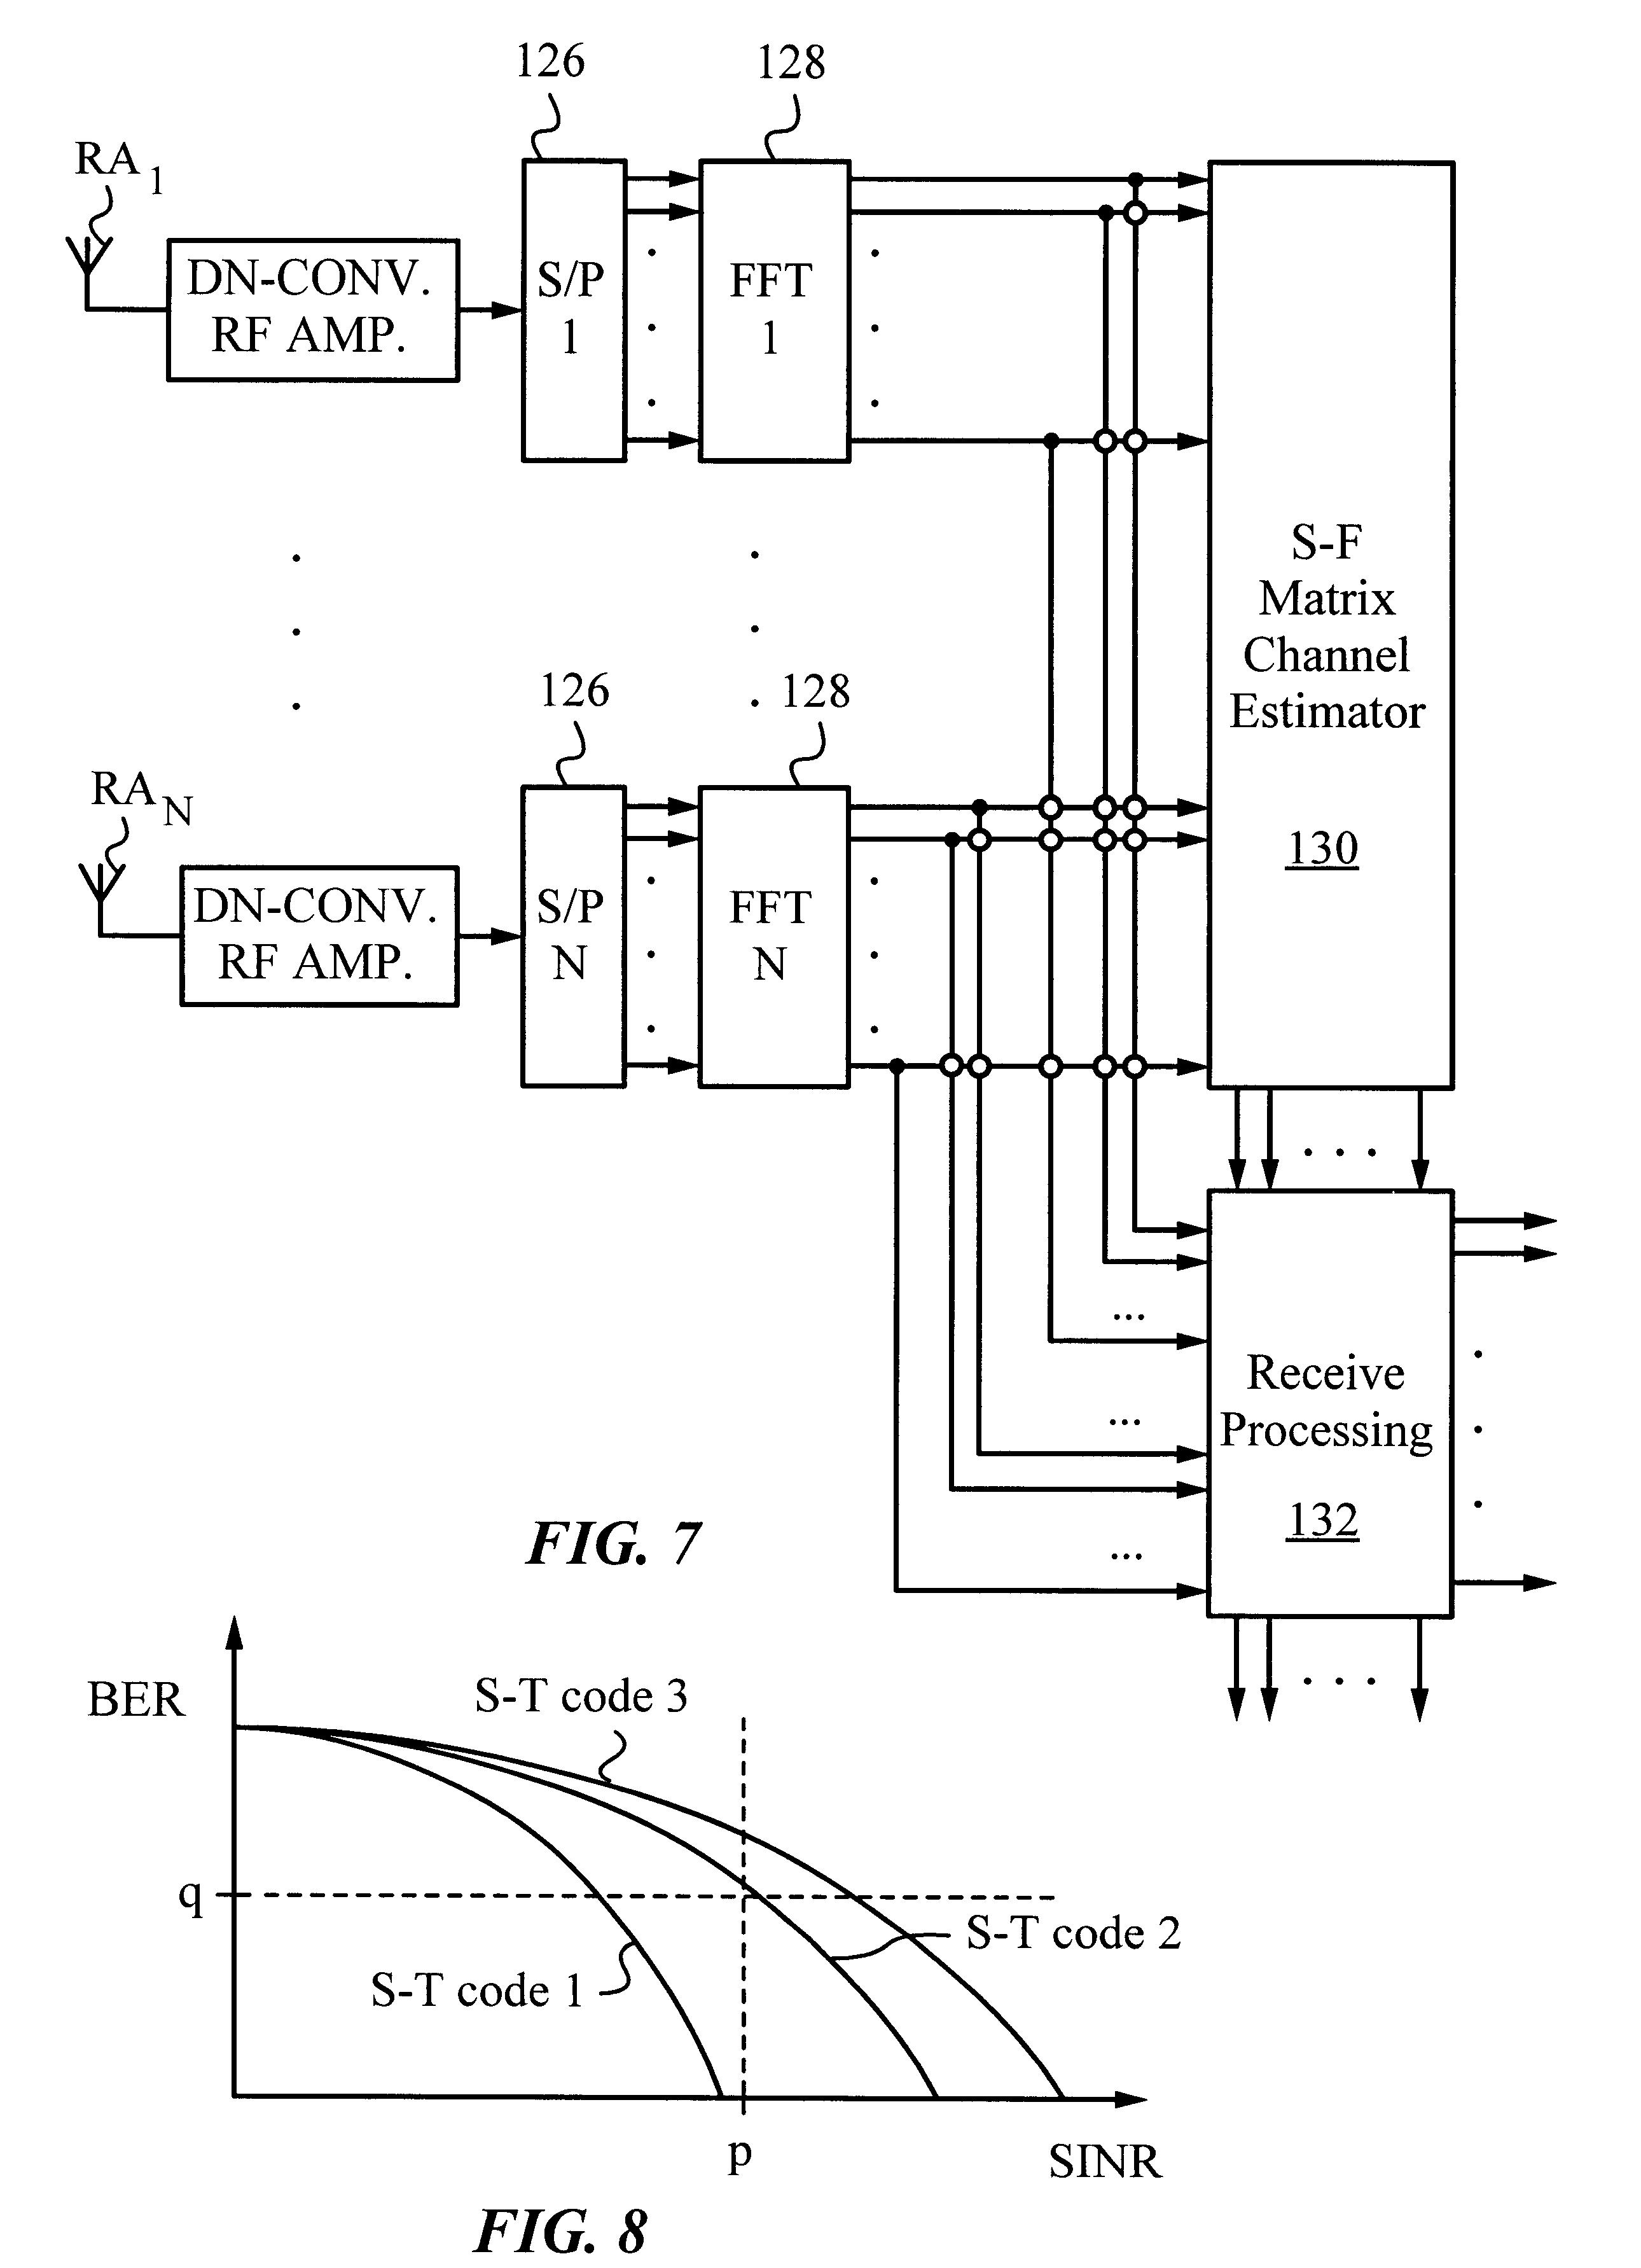 Patent US 6,351,499 B1